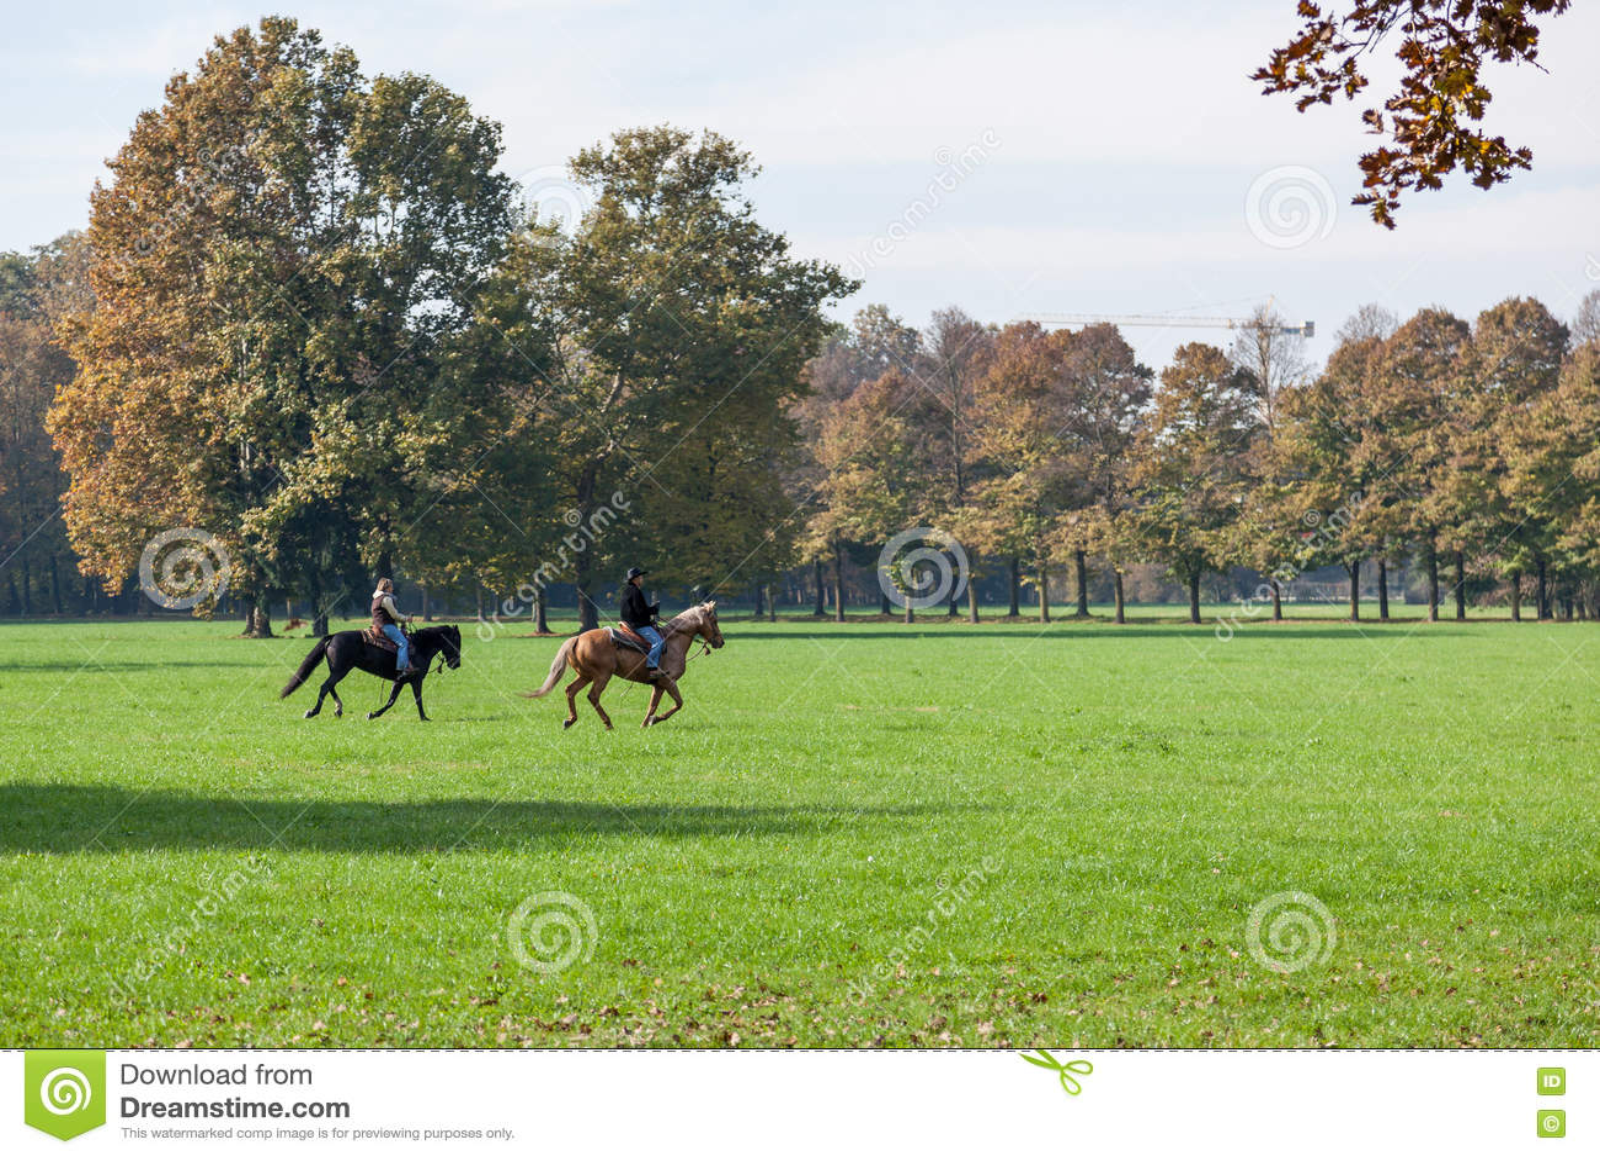 MONZA ITALY/EUROPE - OKTOBER 30: Hästridning i Parco di Monz